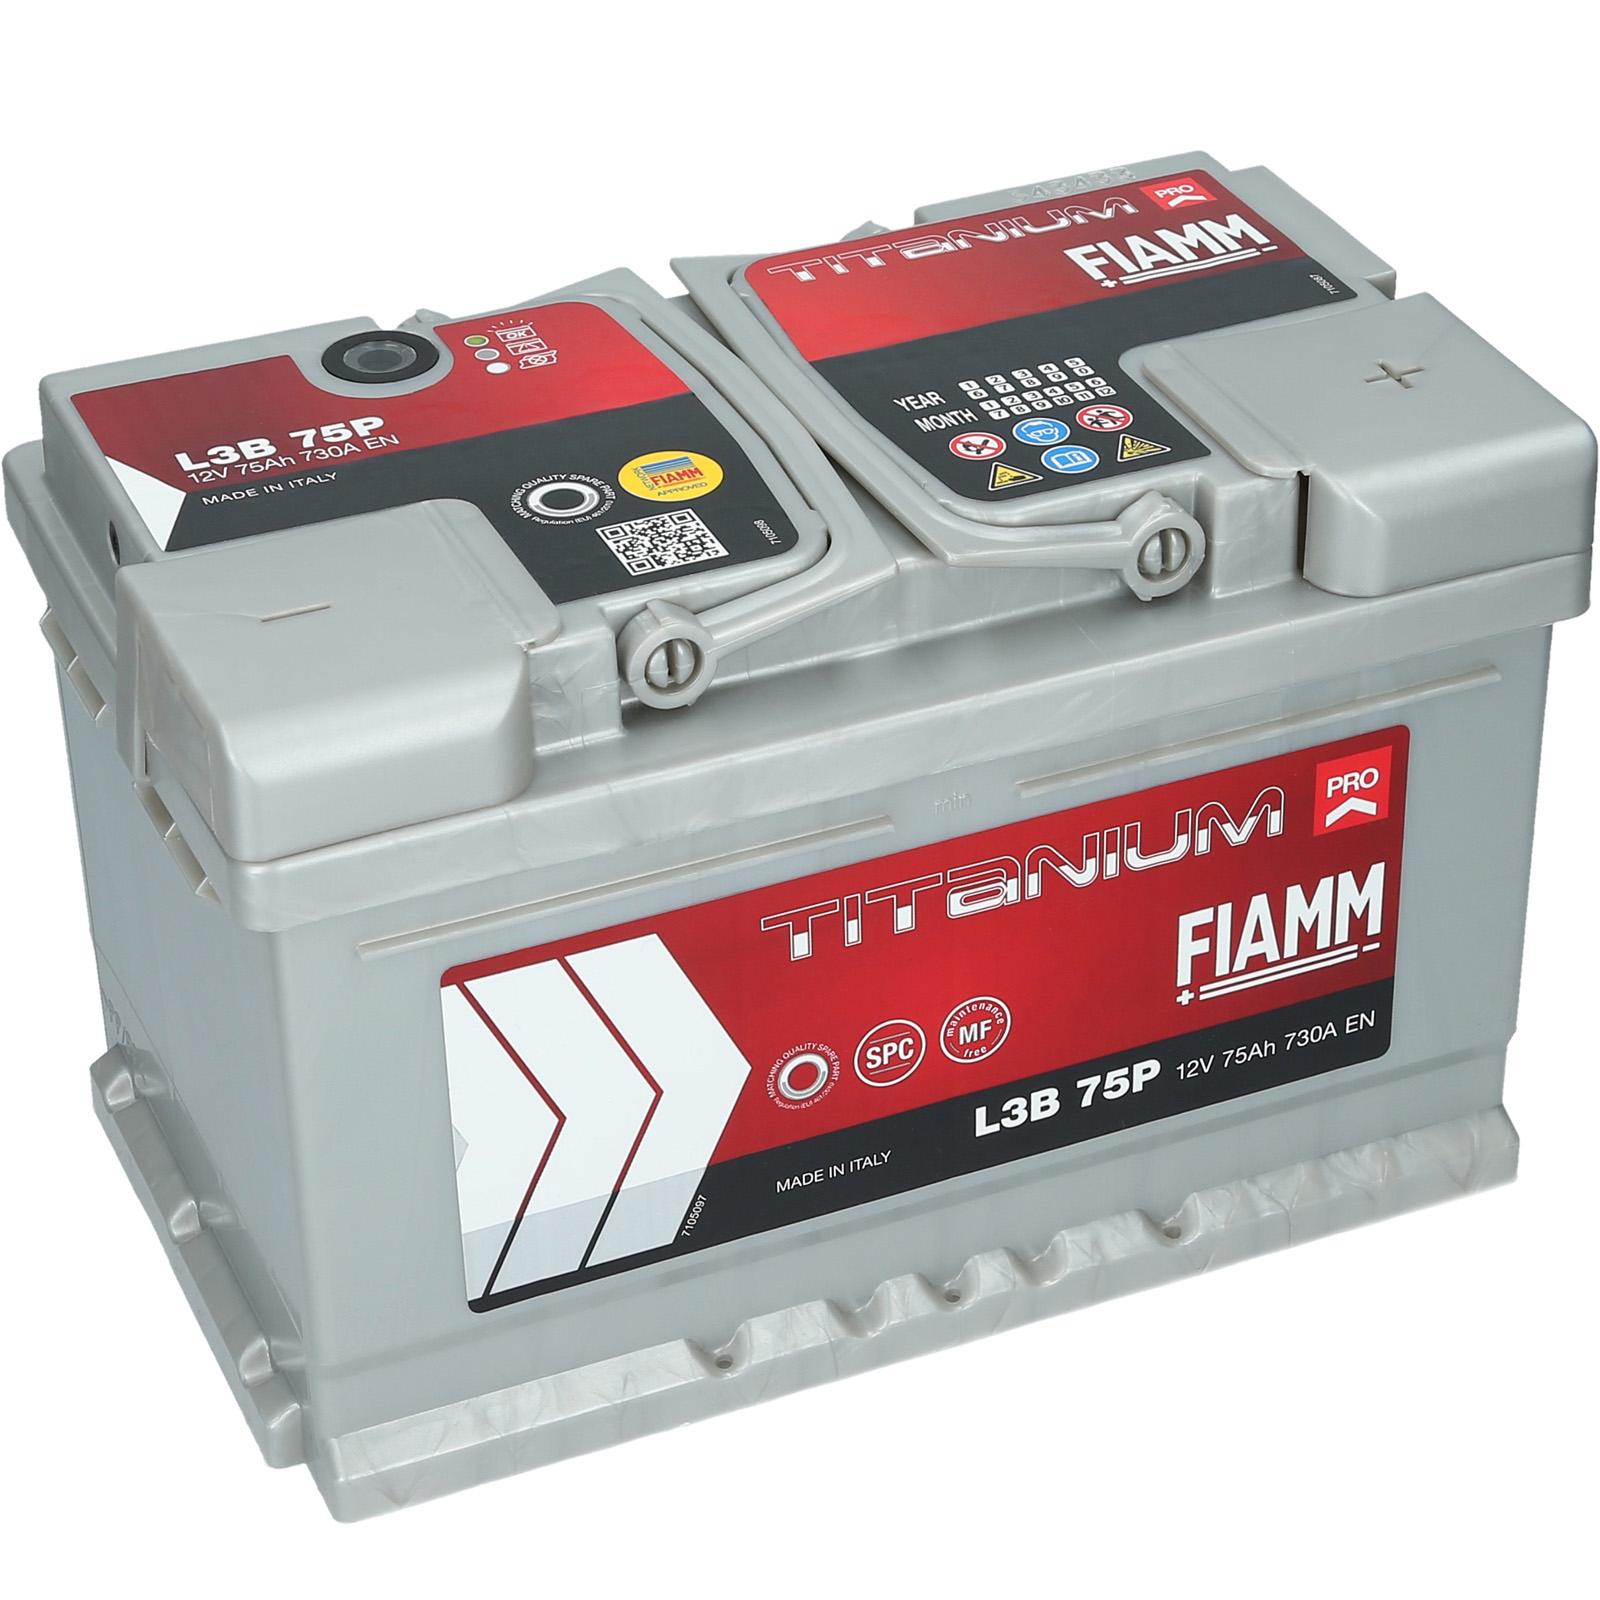 аккумулятор fiamm titanium pro l3b 75p 75ah 730a